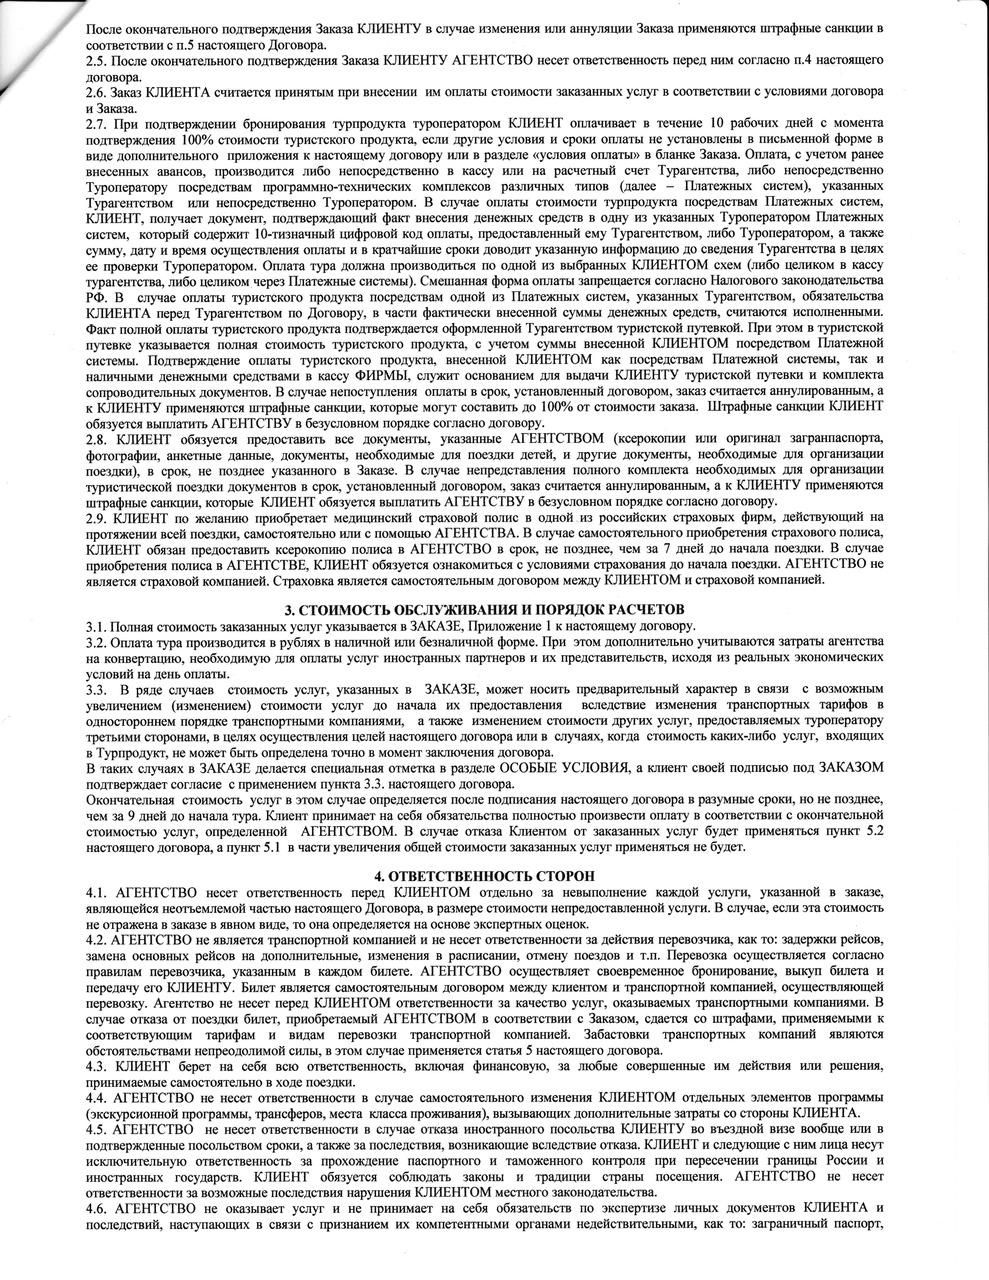 ekaterinatkachenko2jqd66.jpg